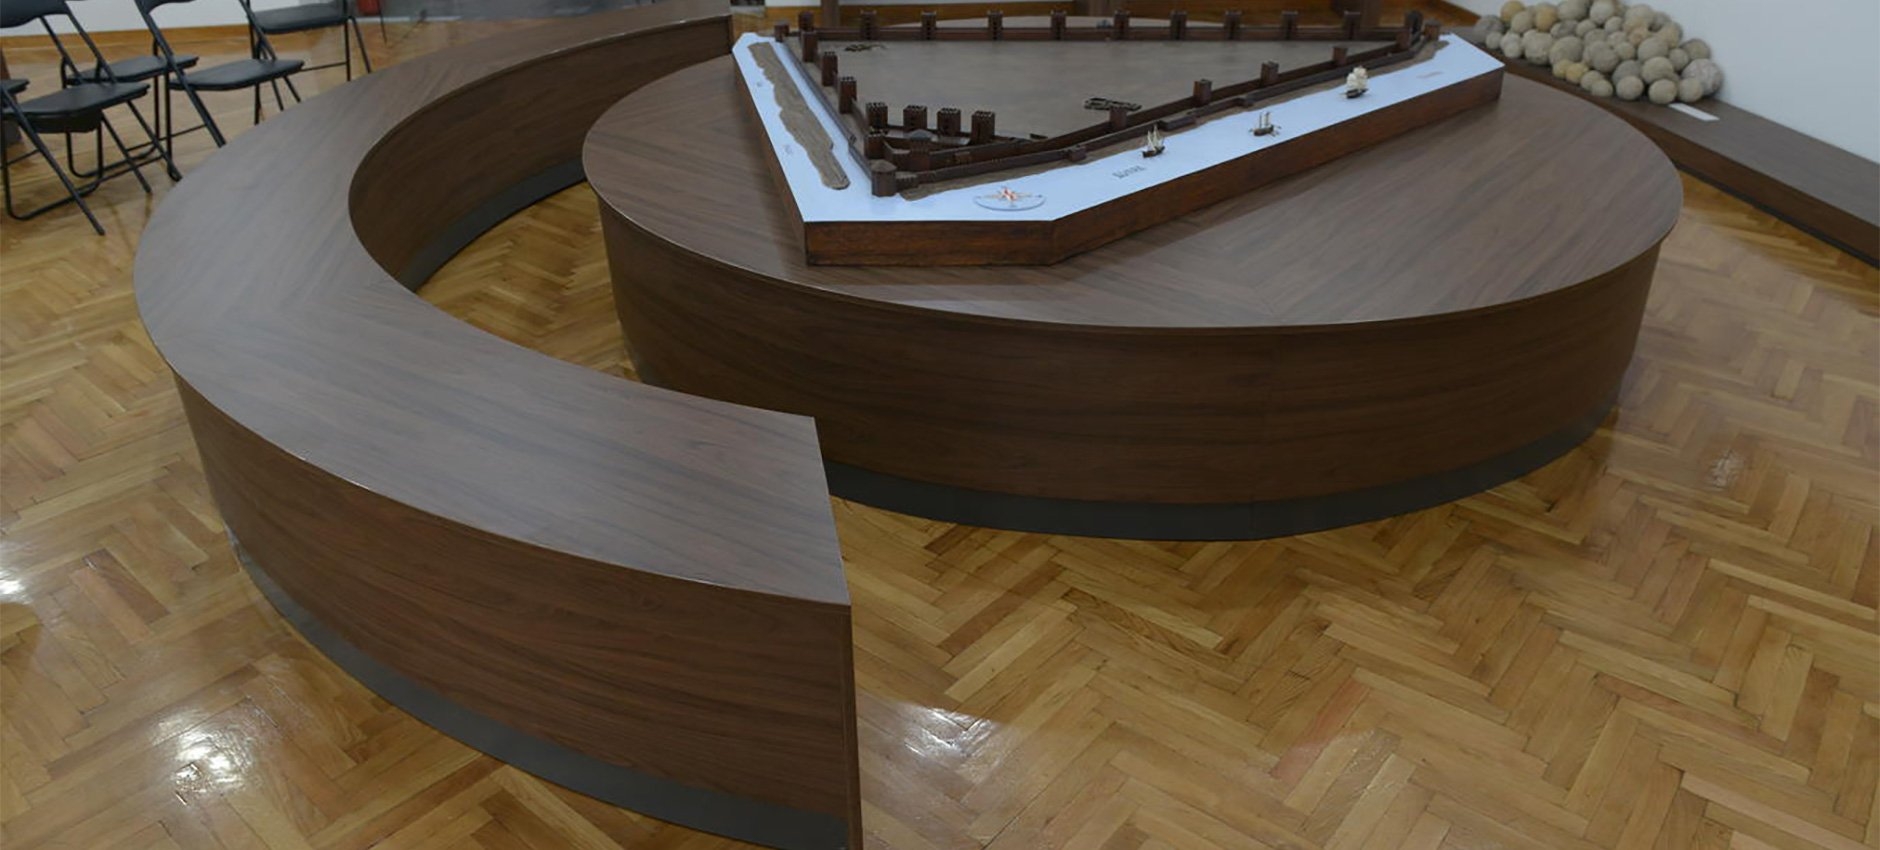 smederevo-muzej-13.jpg